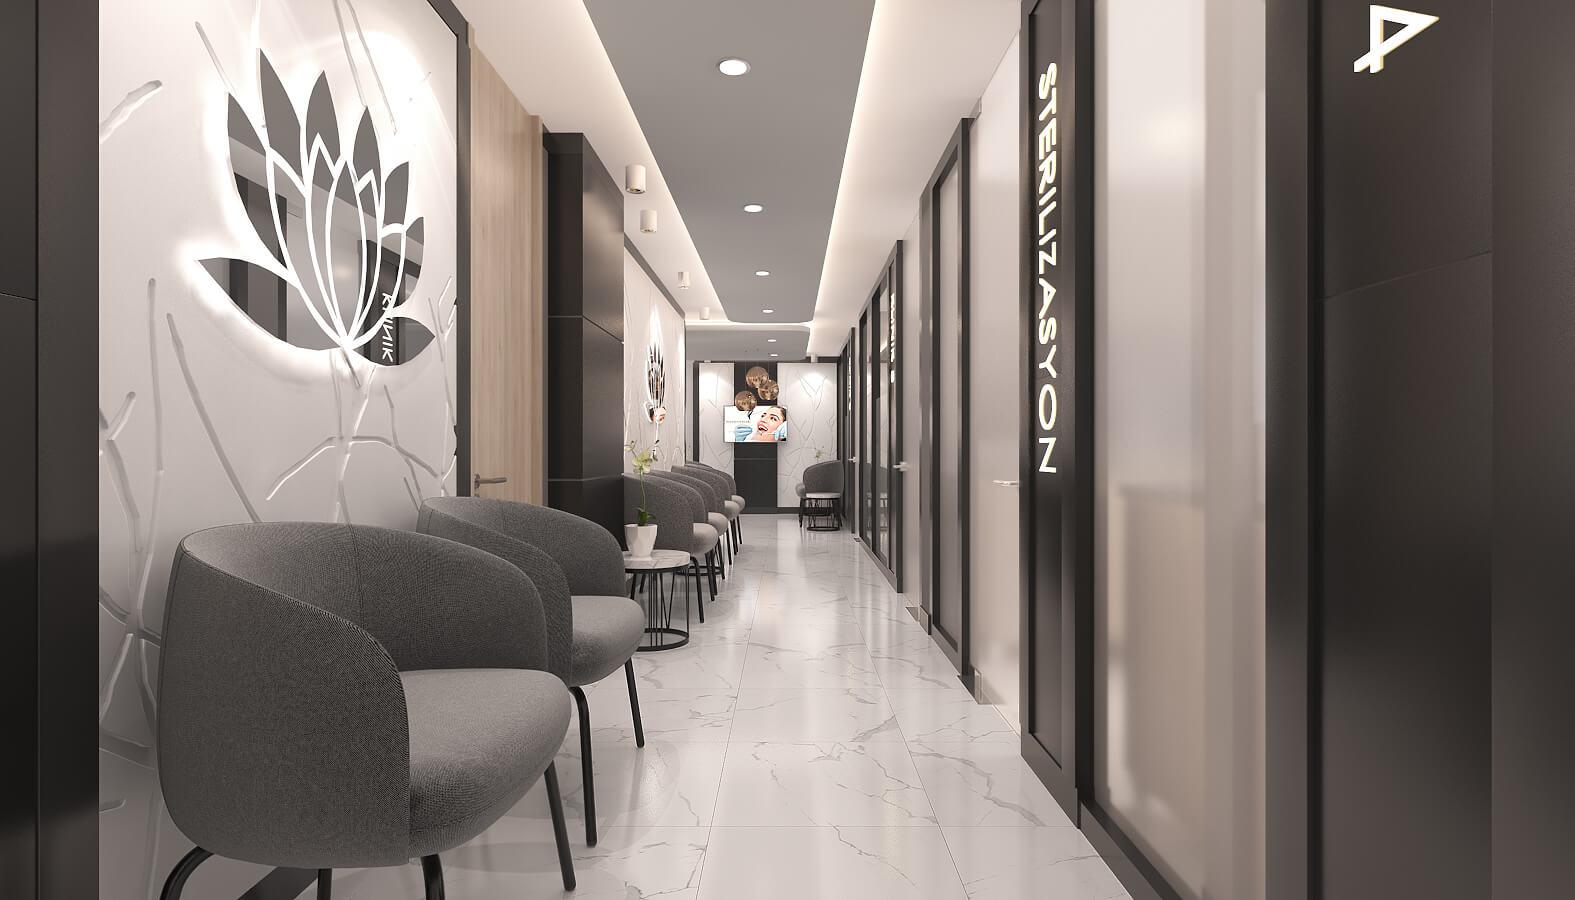 Beauty Center 4576 Dentapol Dental Polyclinic Healthcare